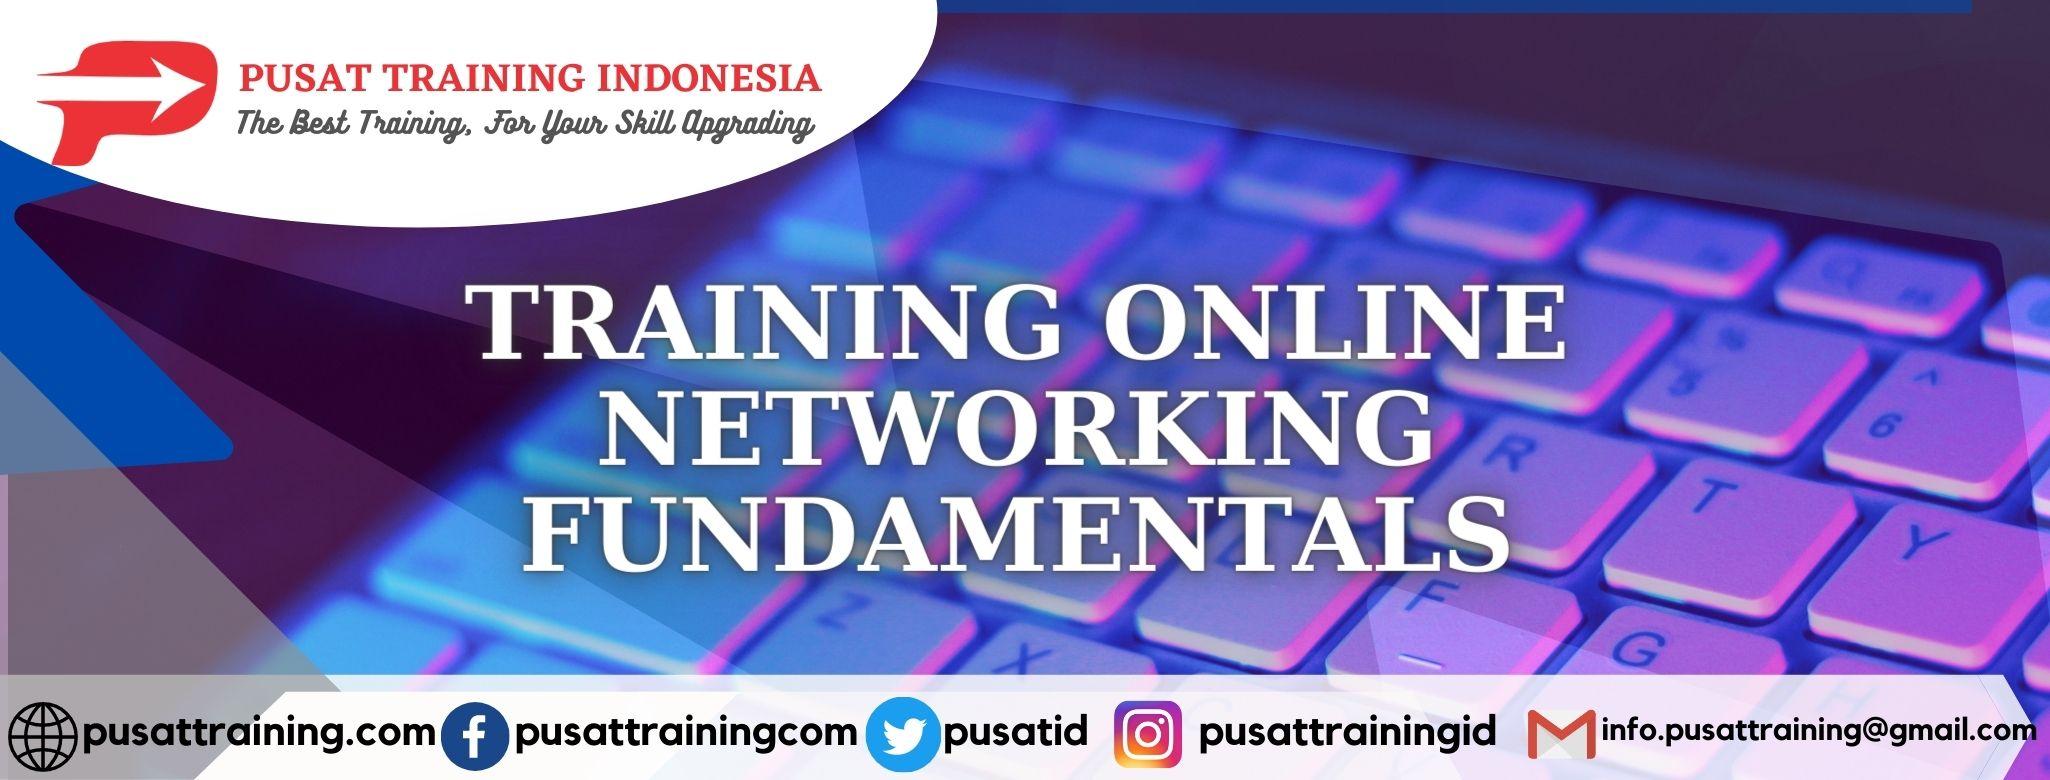 training-online-networking--fundamentals